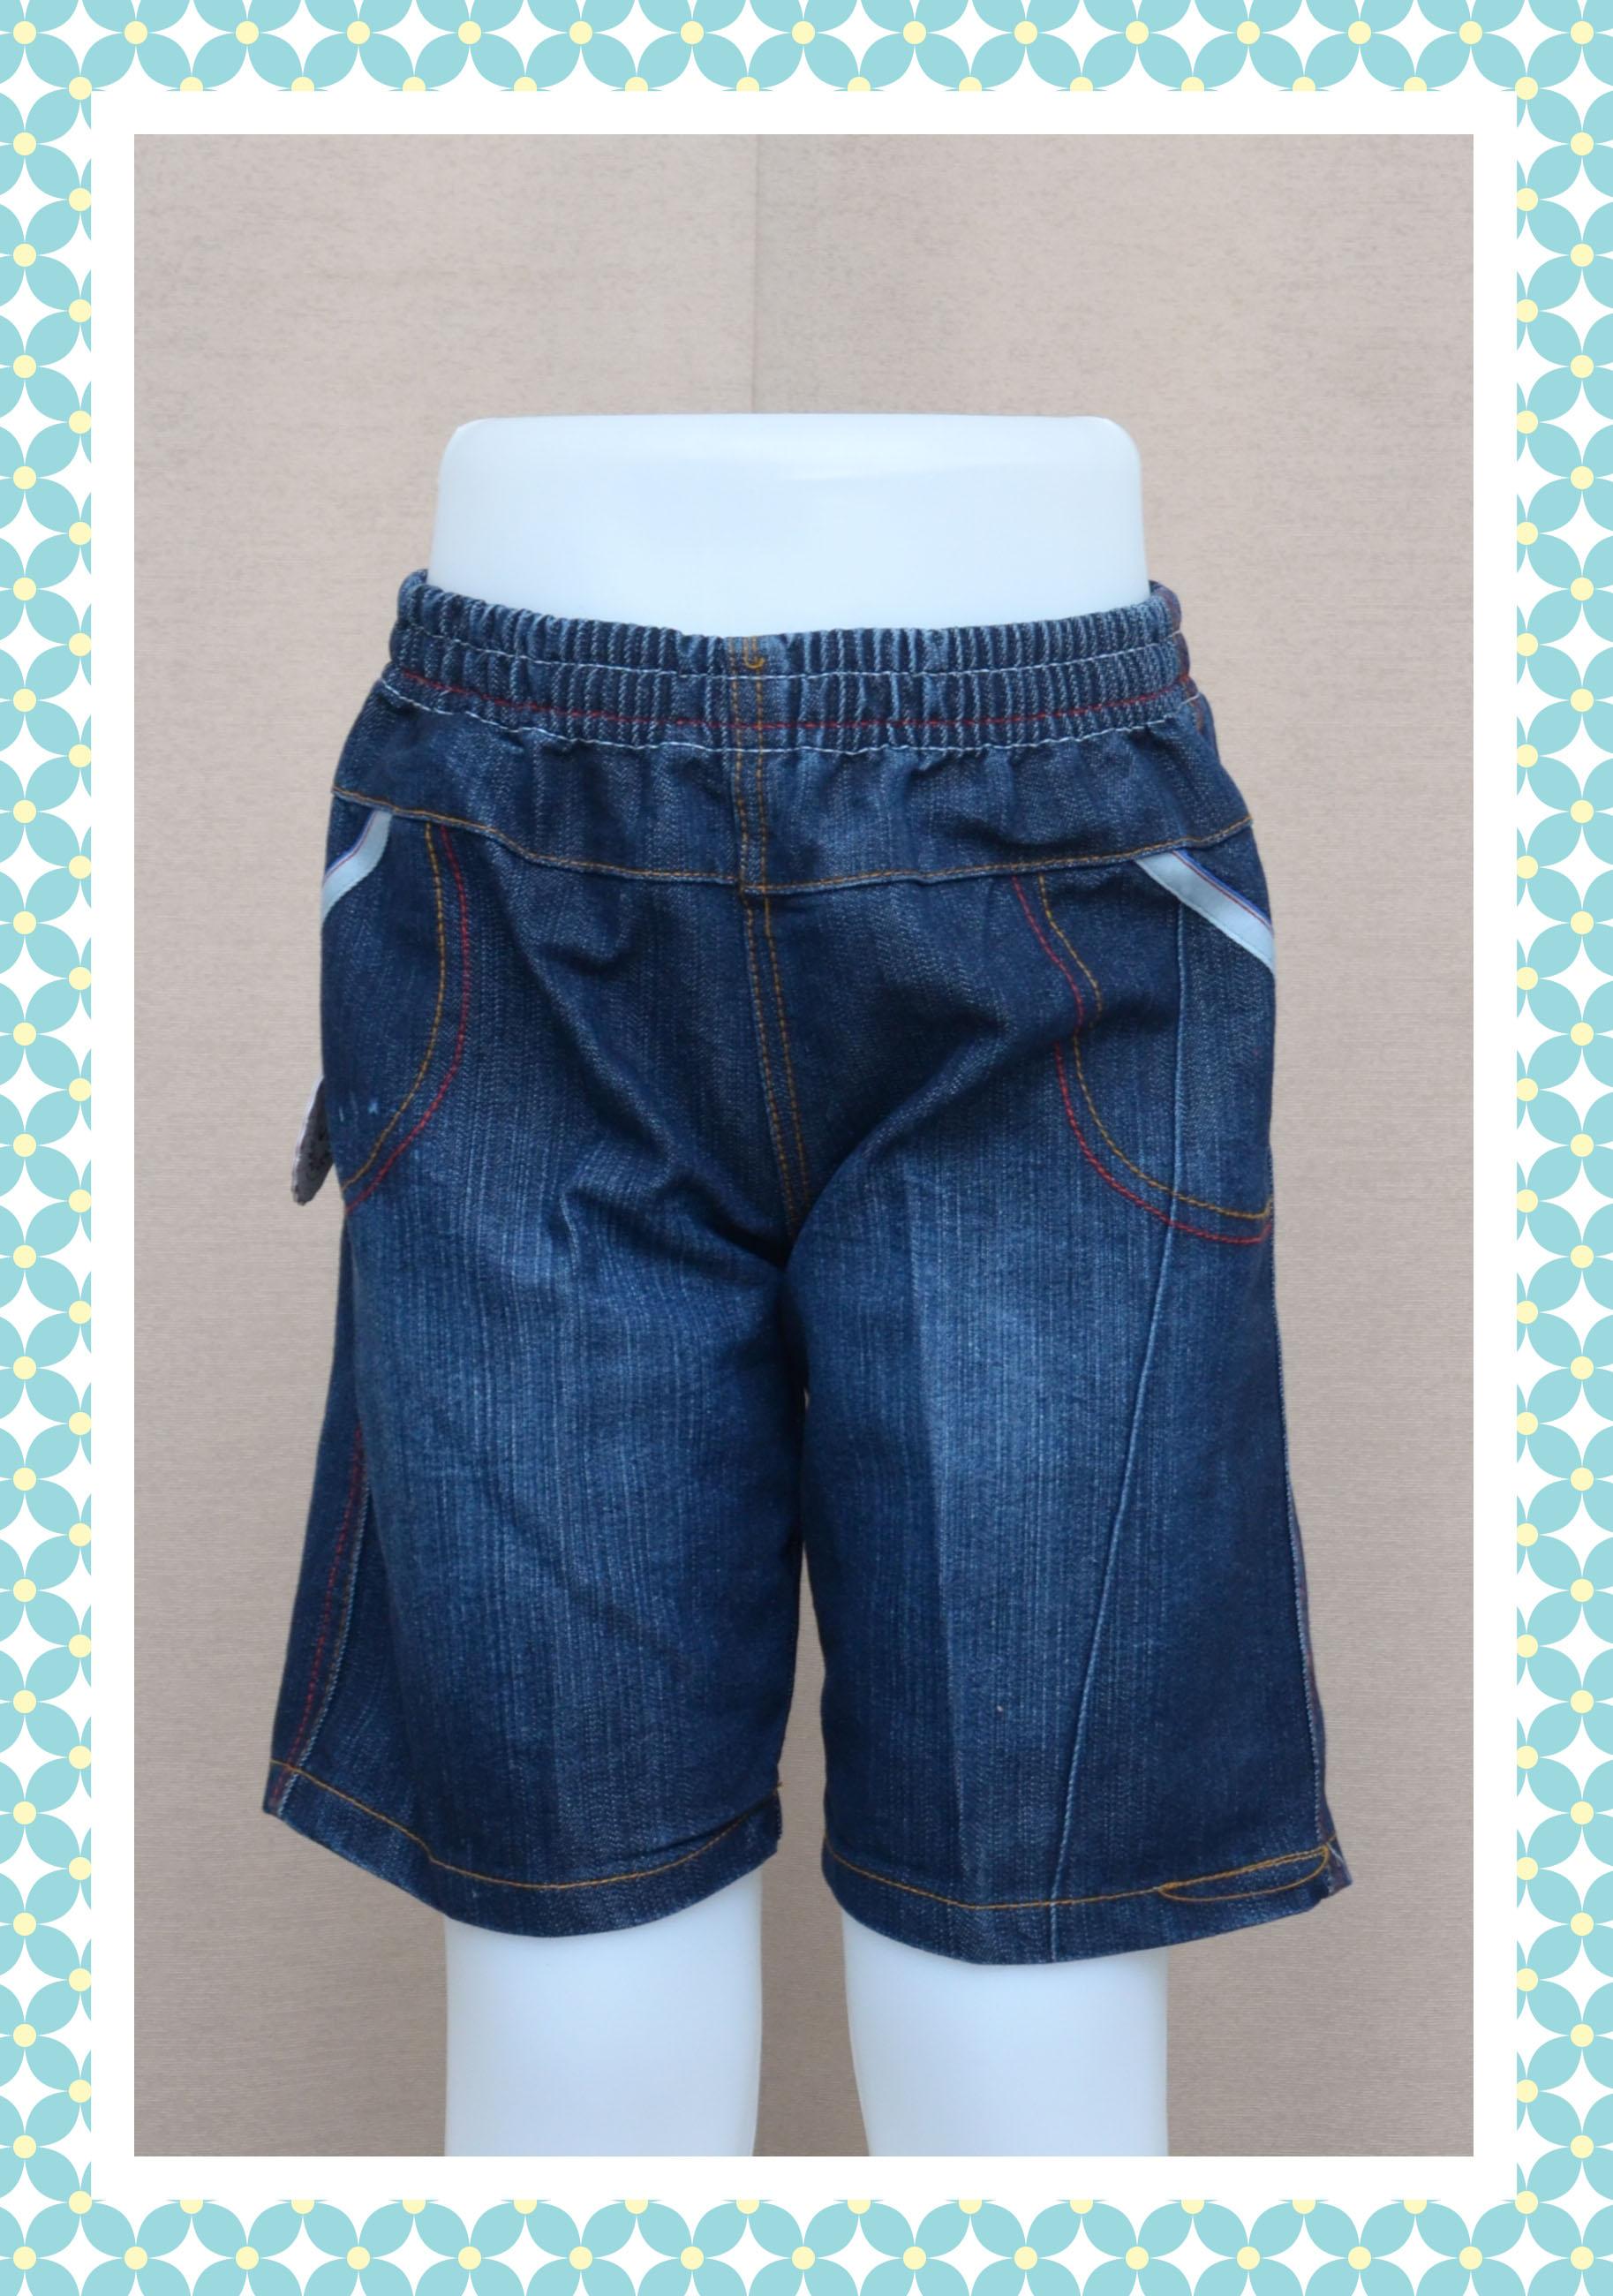 Jeans nick anak murah